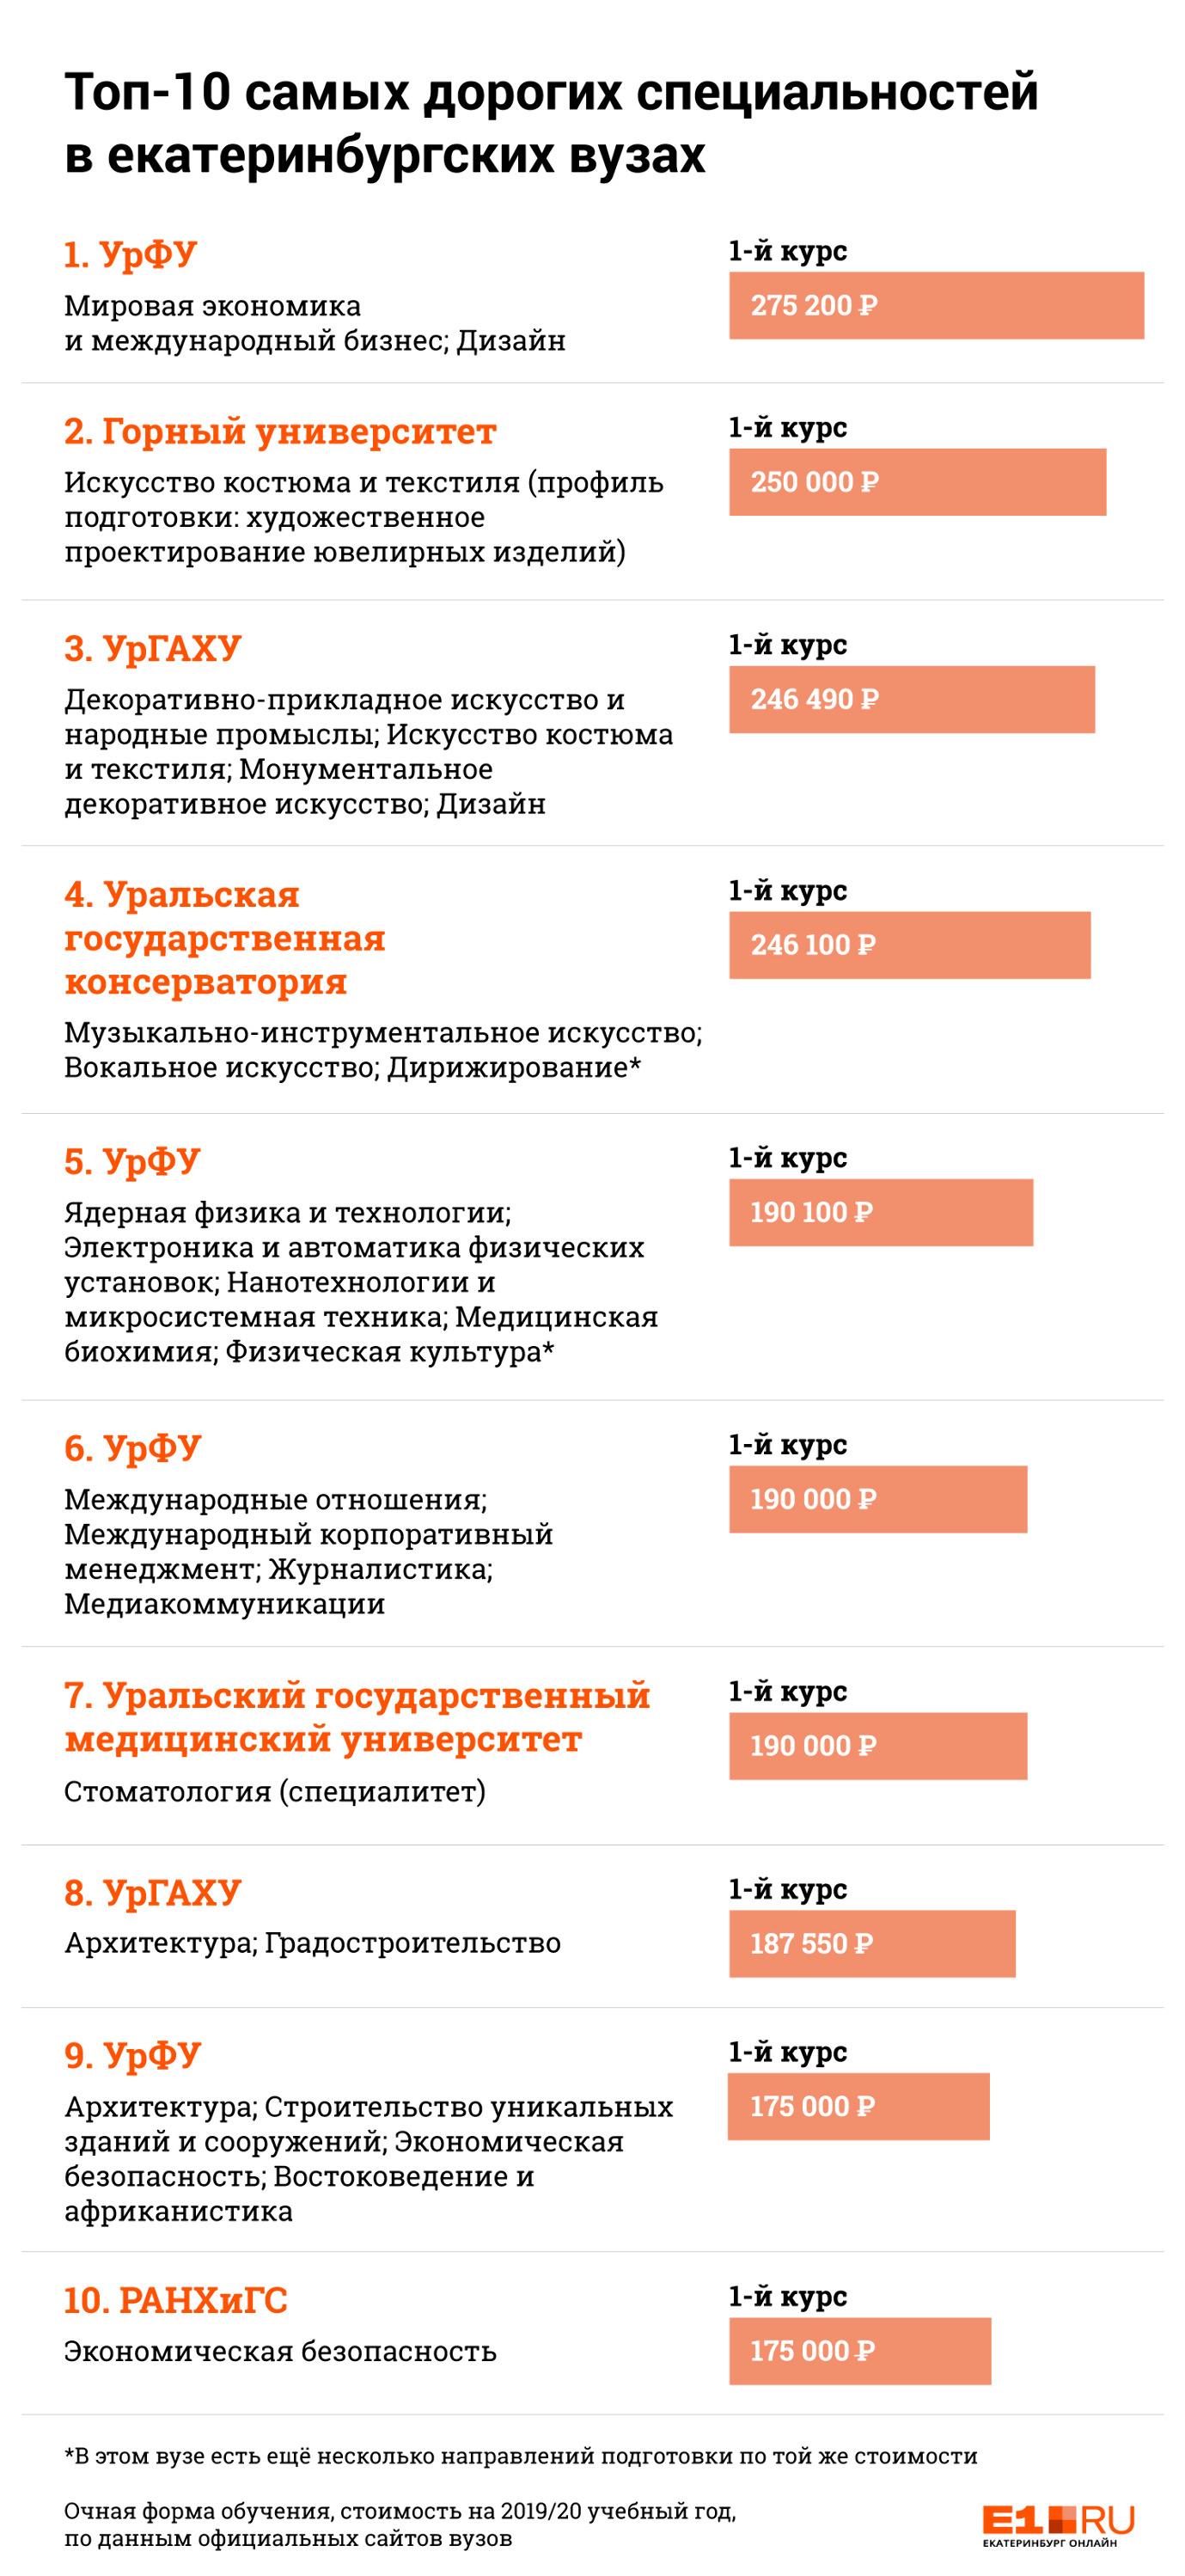 https://static.ngs.ru/news/99/preview/21a3899315234616afeab9305e912b1c0886410d_1379.jpg